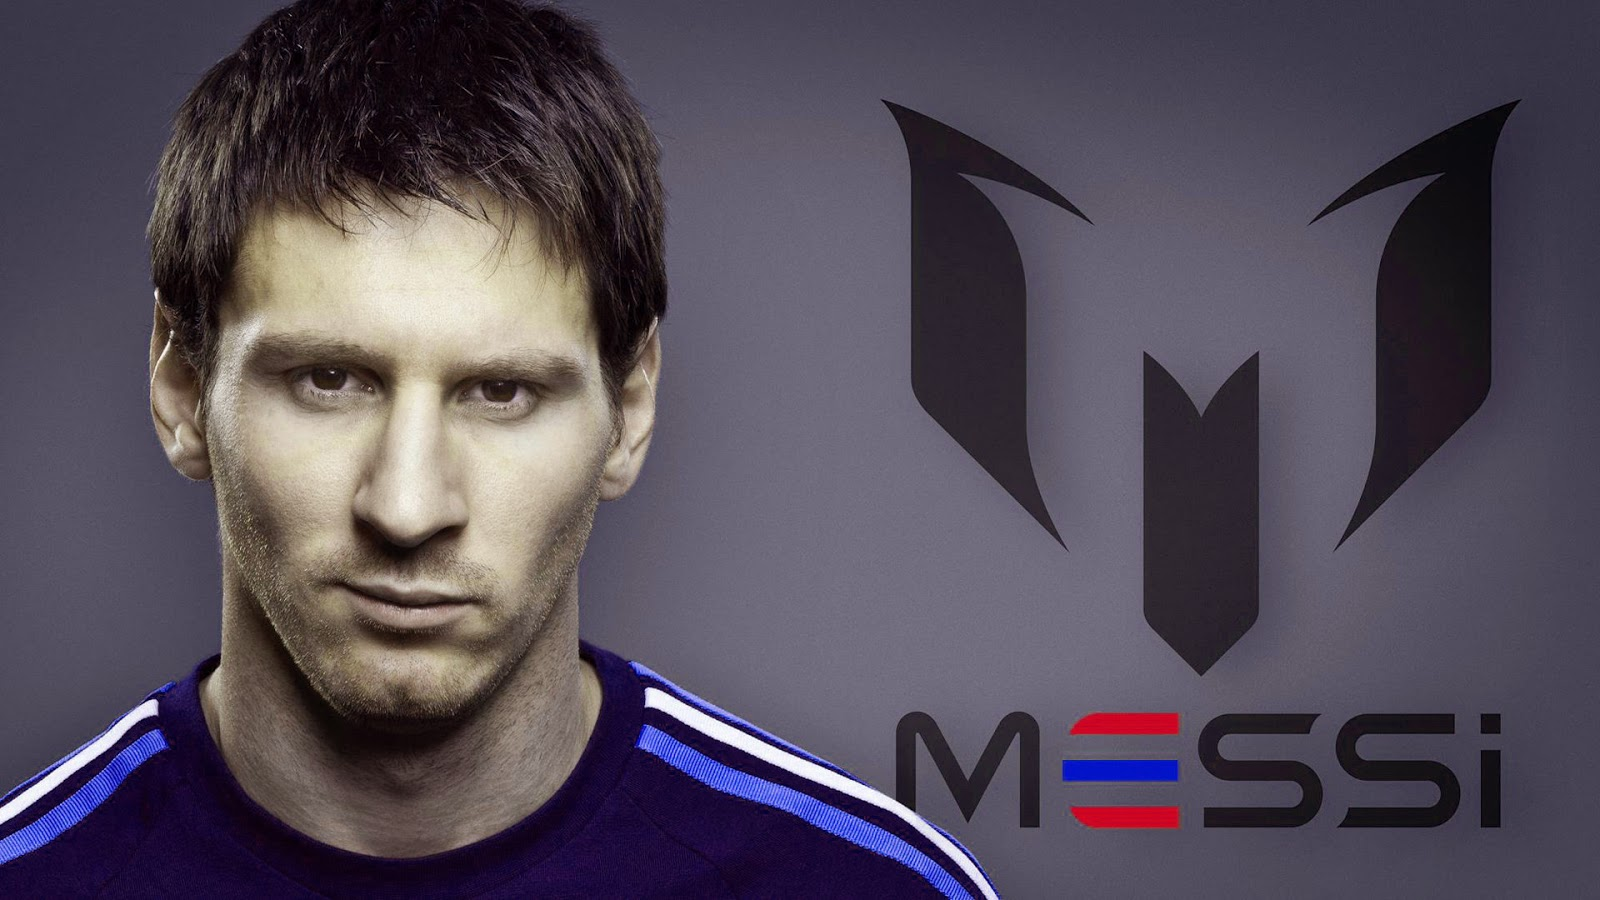 Messi wide wallpaper